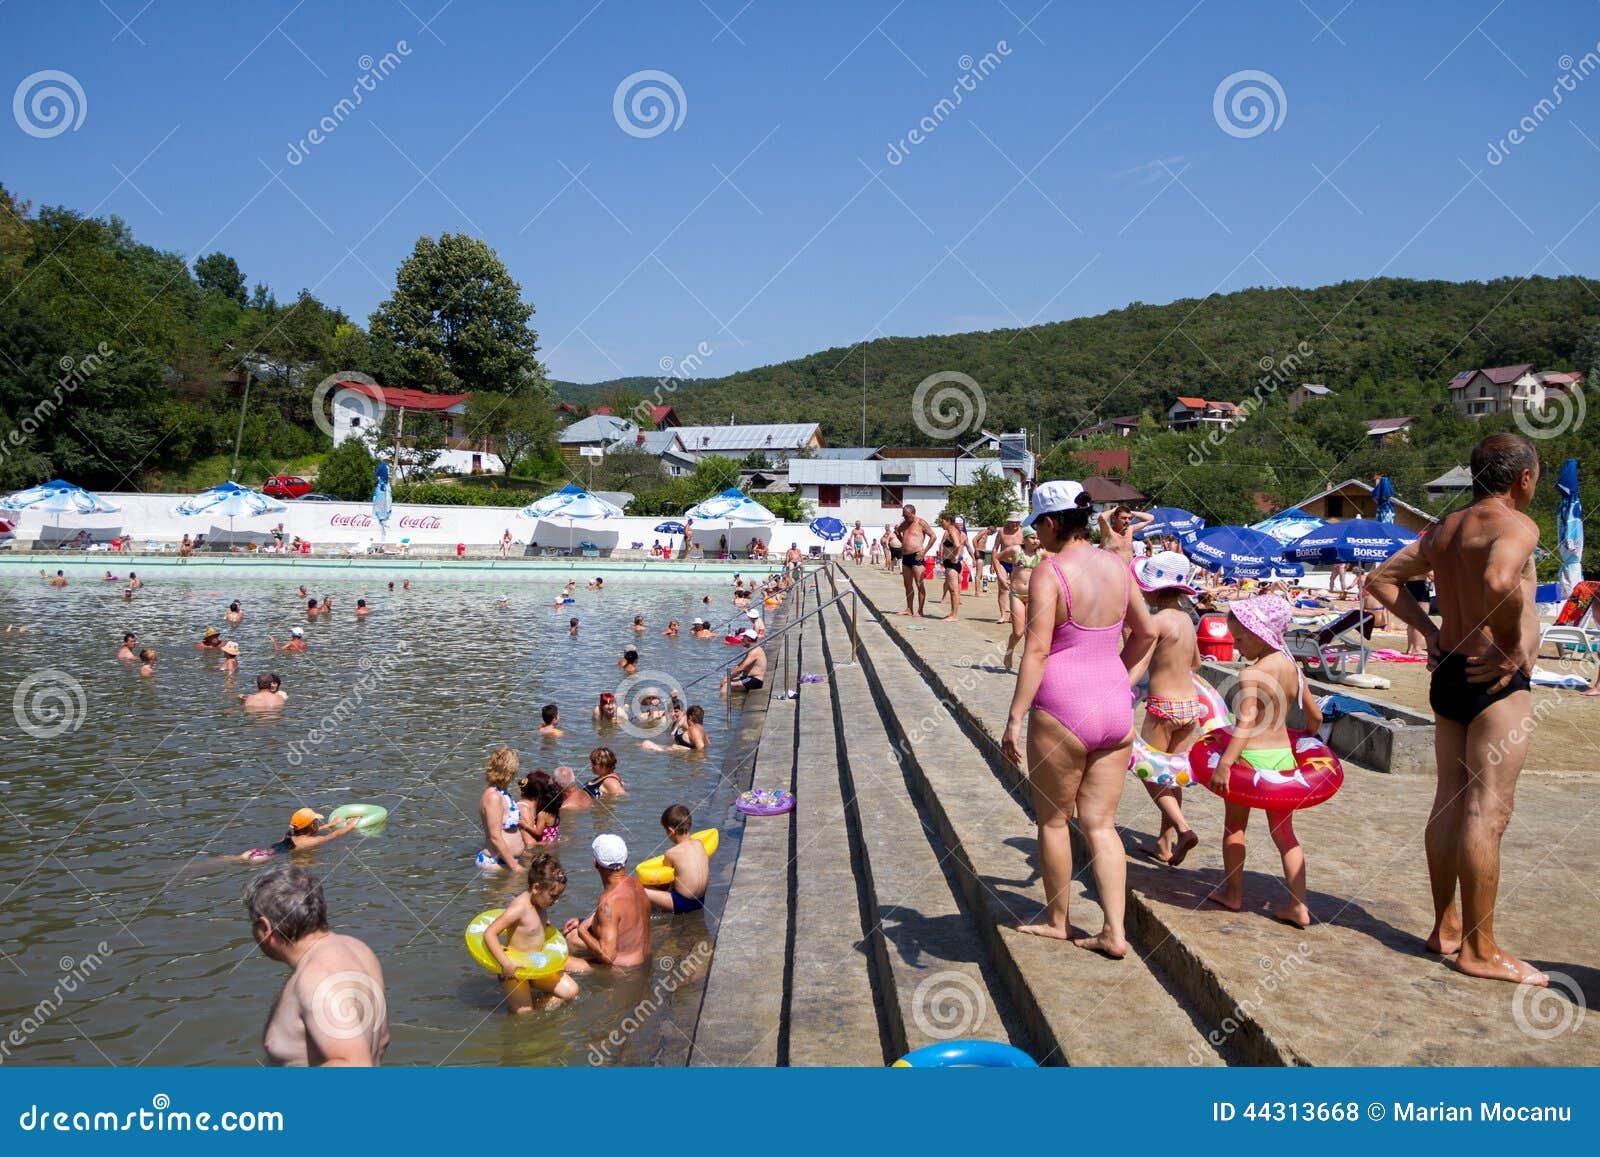 People swimming in public pool editorial stock photo image 44313668 for Alderwood pool public swim times